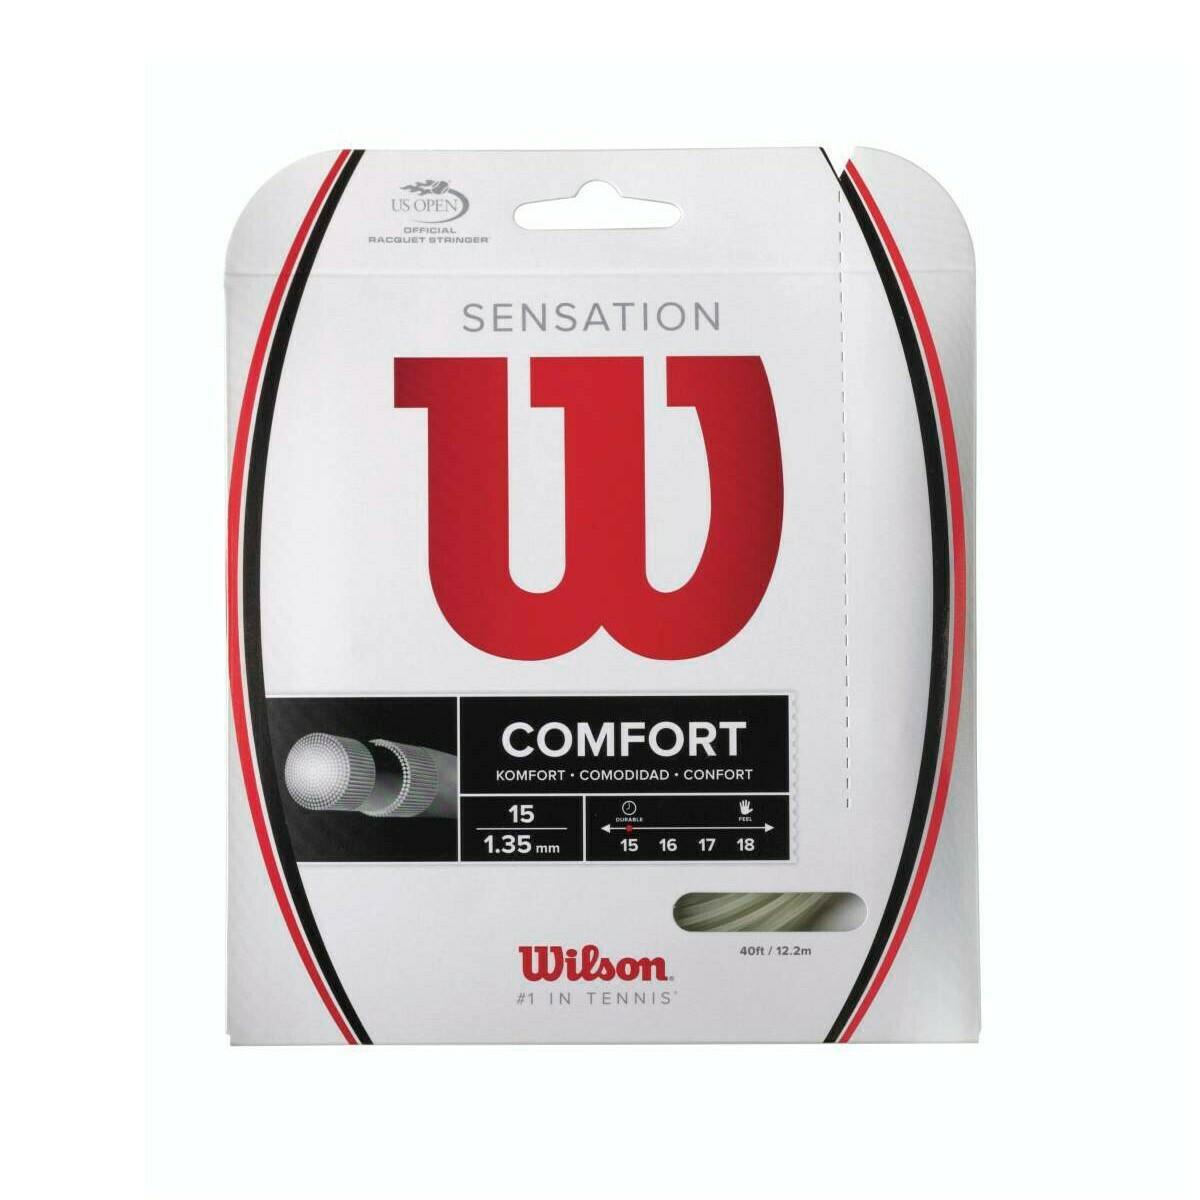 Wilson Sensation Comfort 16 Tennis String Set